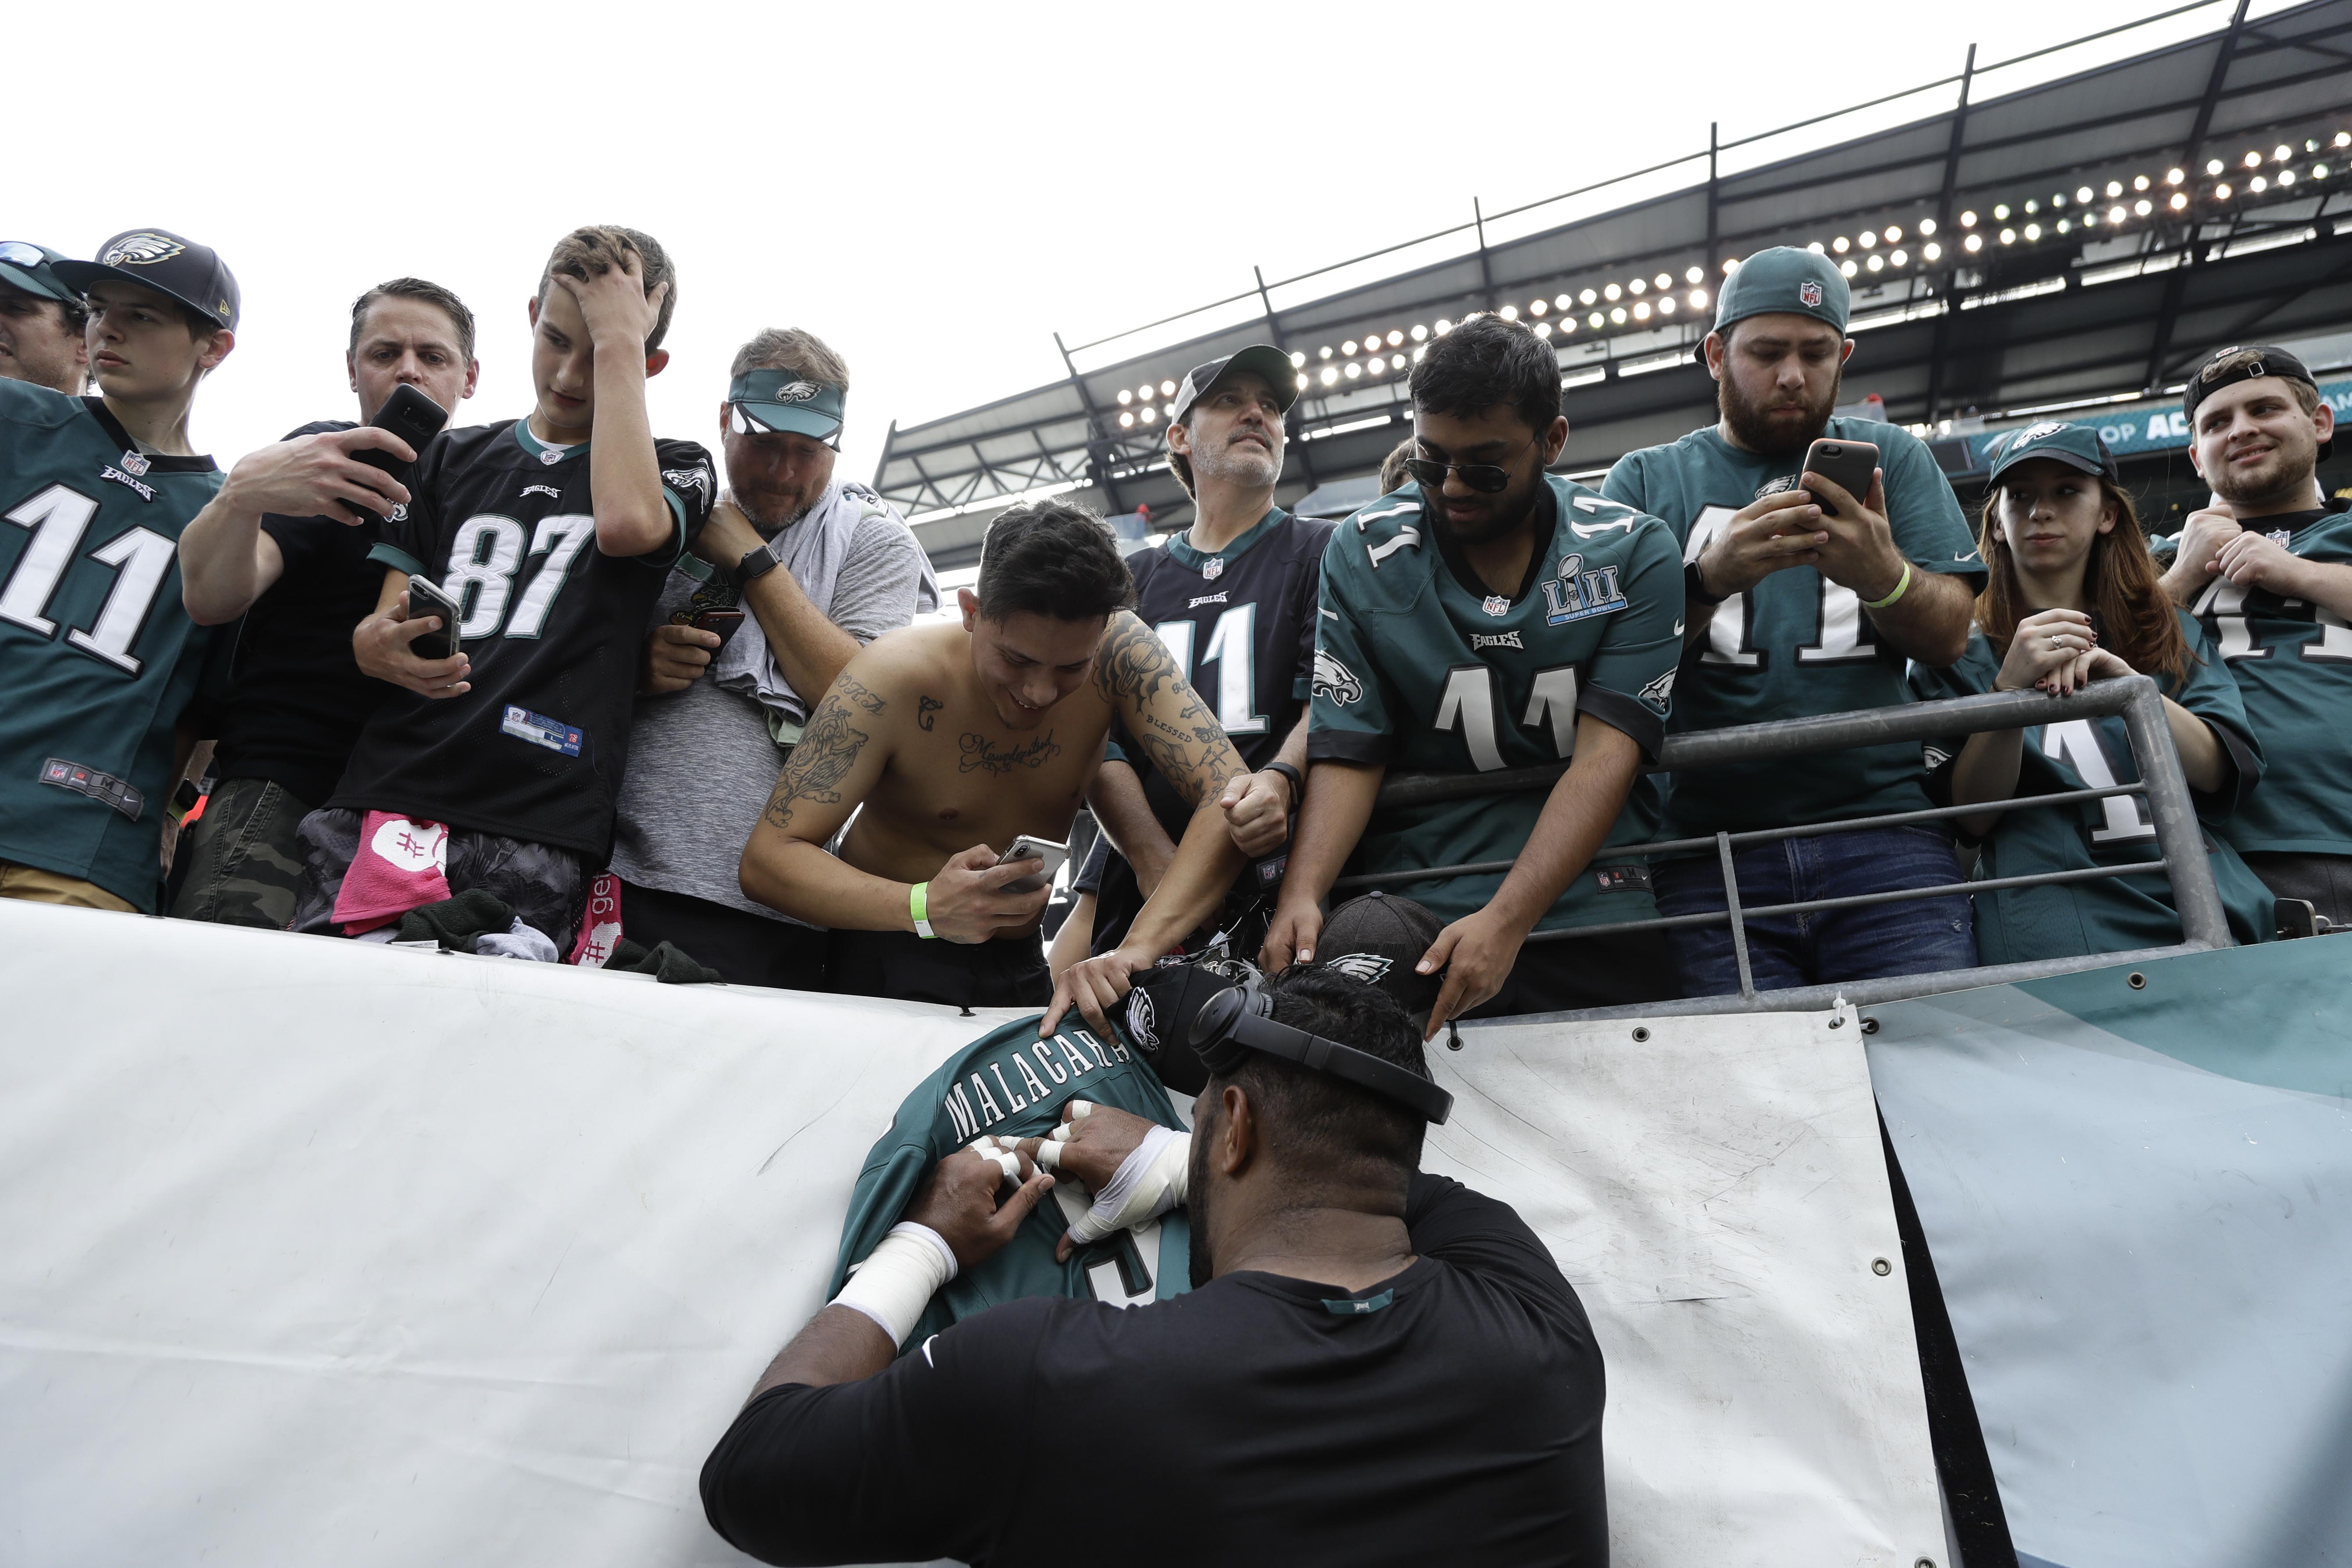 Philadelphia Eagles´ Jordan Mailata signs autographs for fans before an NFL football game against the Minnesota Vikings, Sunday, Oct. 7, 2018, in Philadelphia. (AP Photo/)